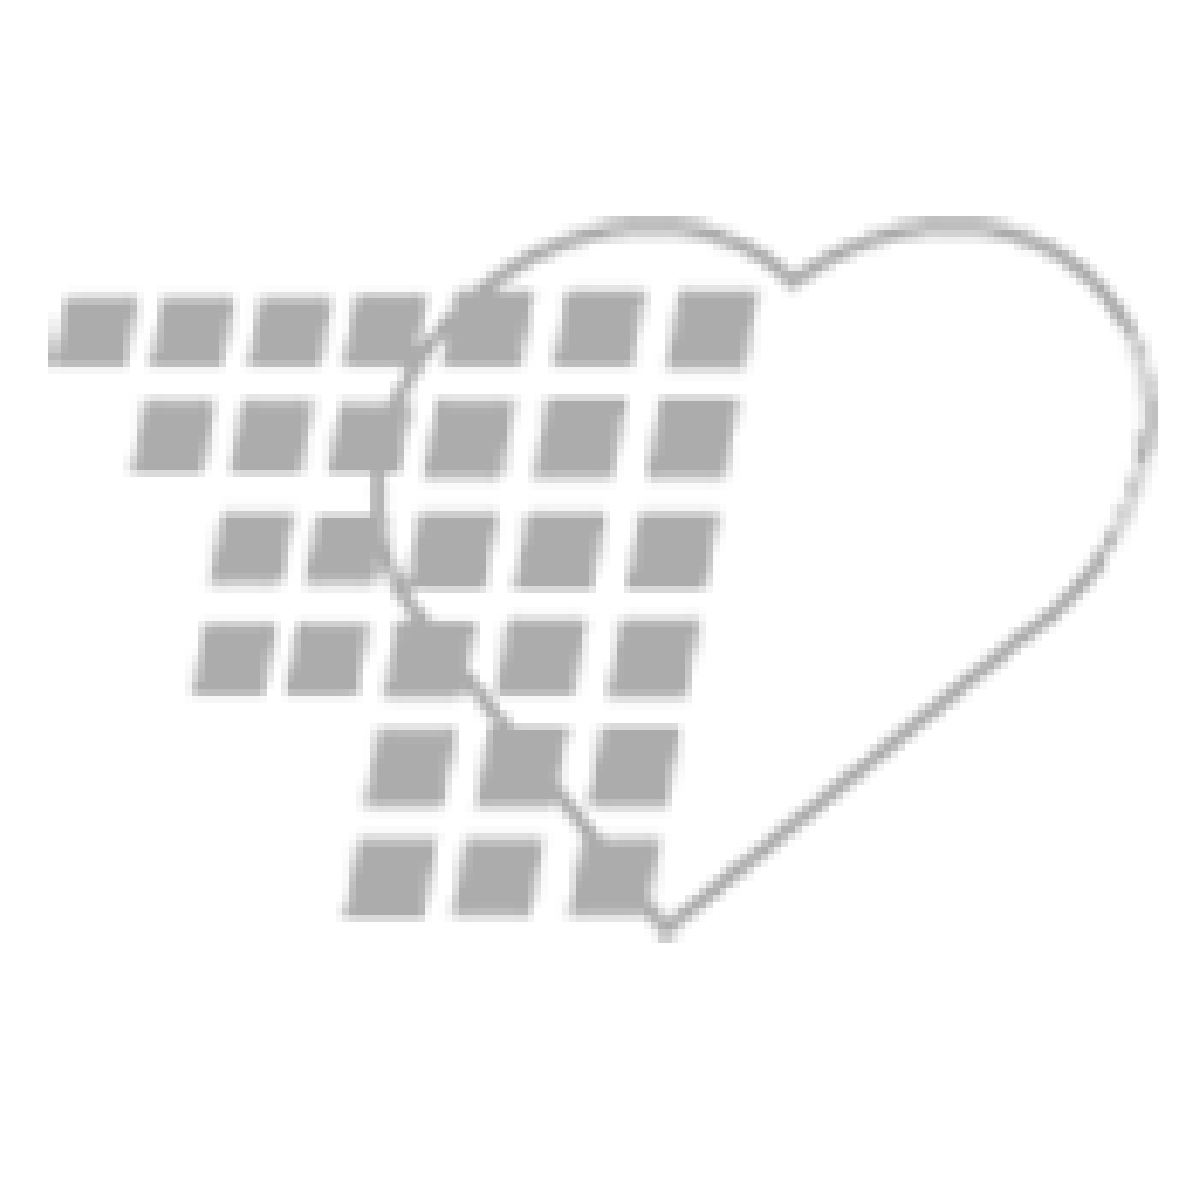 02-20-0731 - Multikuf   Portable 3 Cuff Sphyg Kit